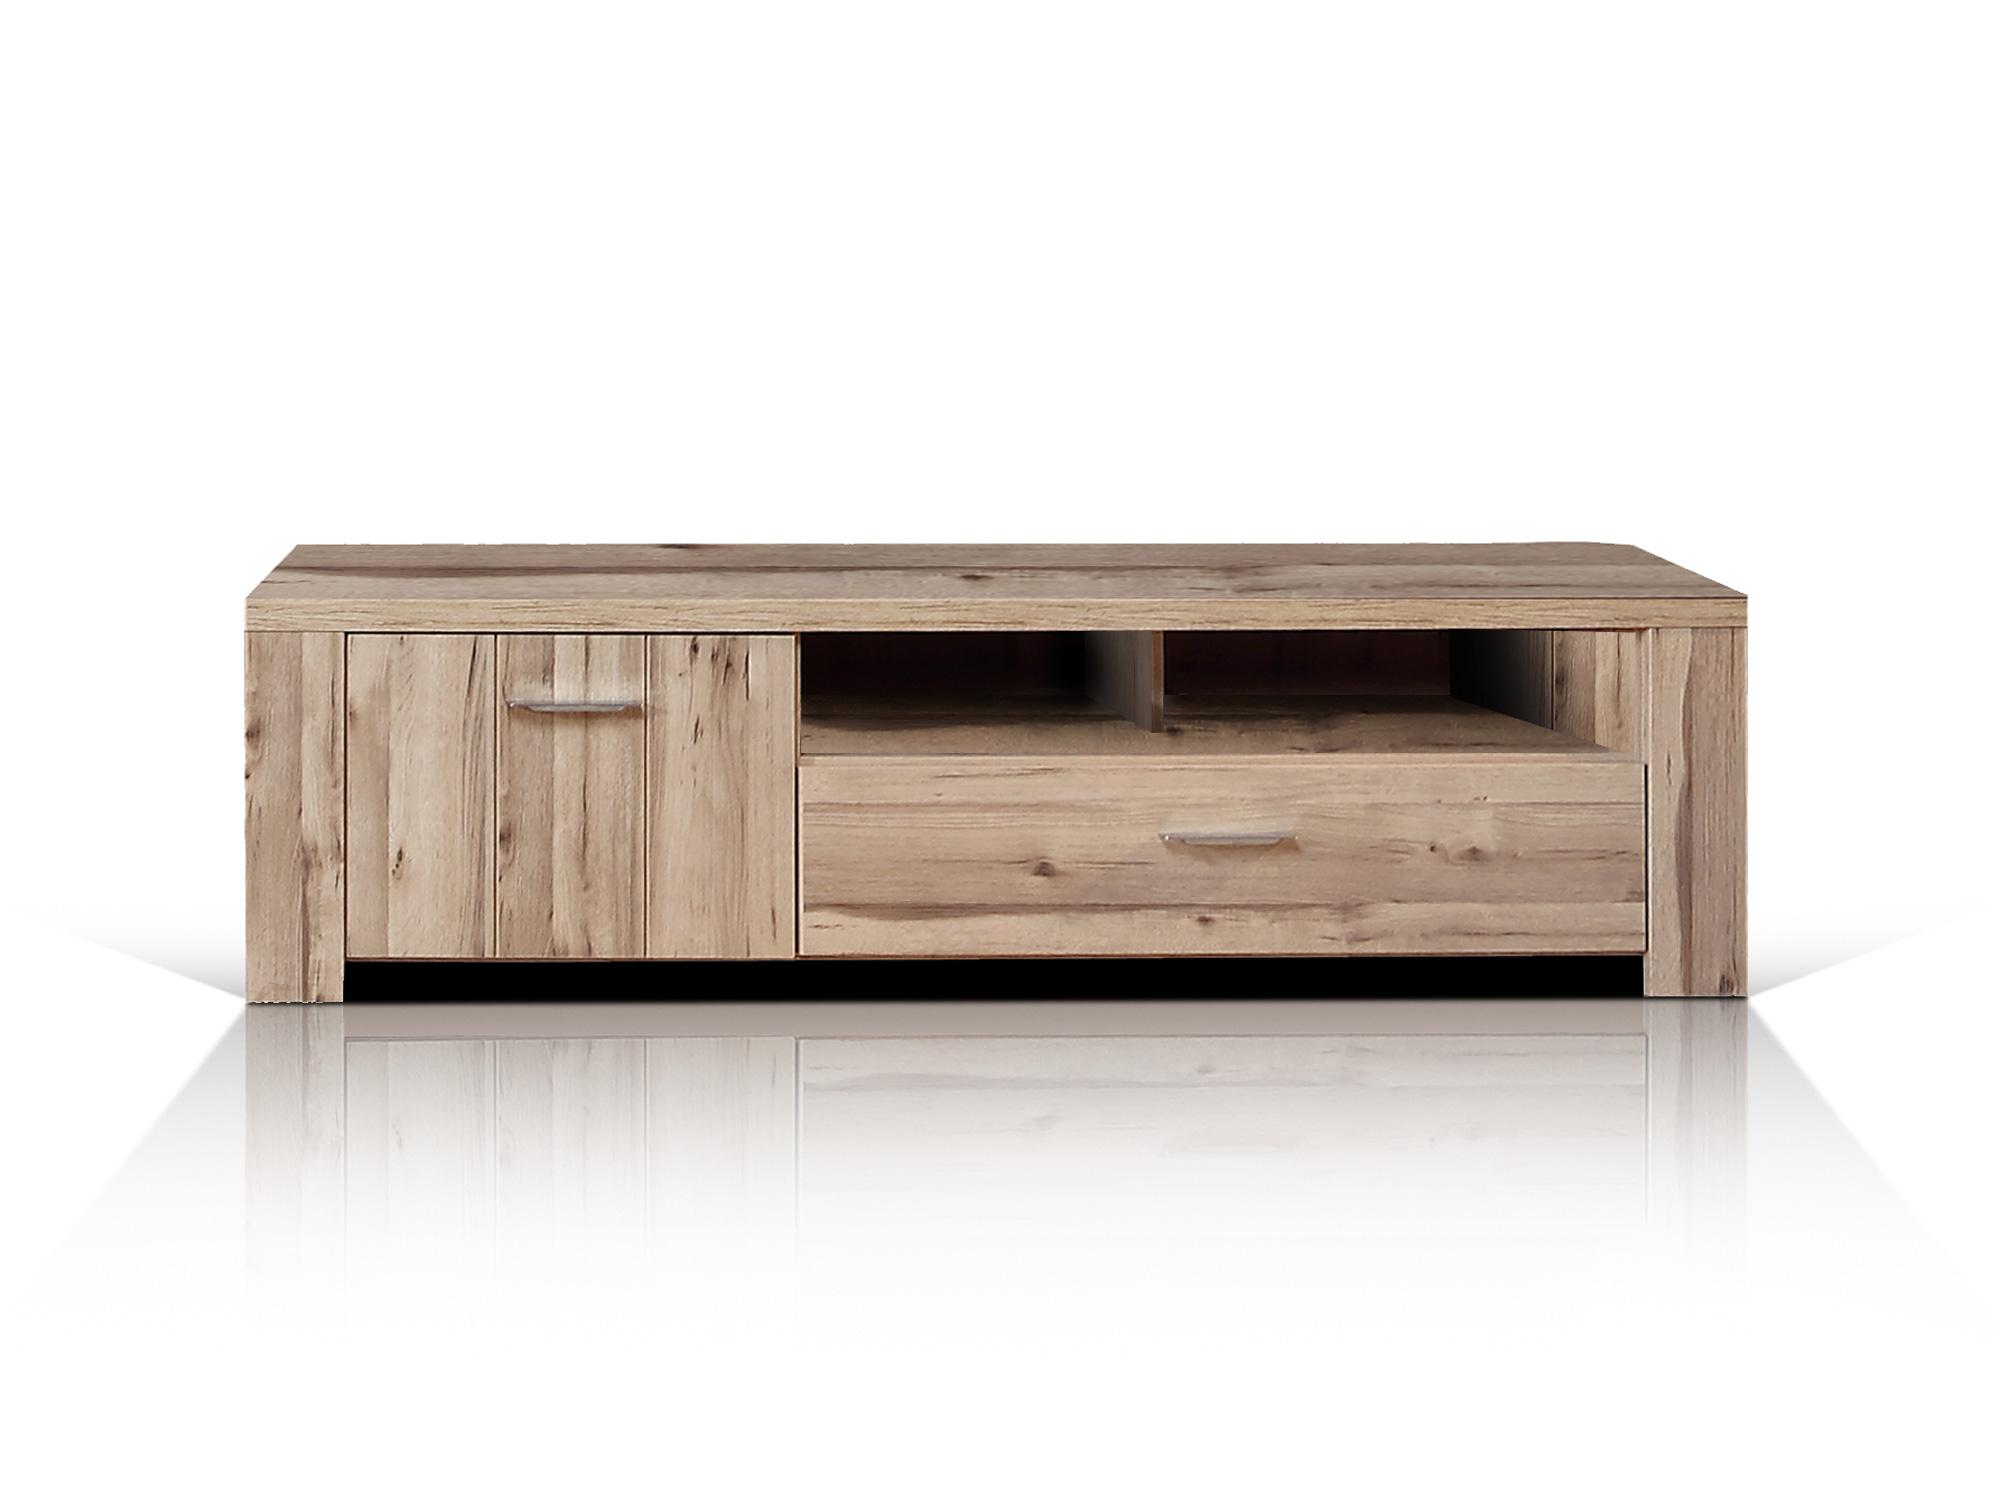 cuba tv unterschrank planked eiche. Black Bedroom Furniture Sets. Home Design Ideas